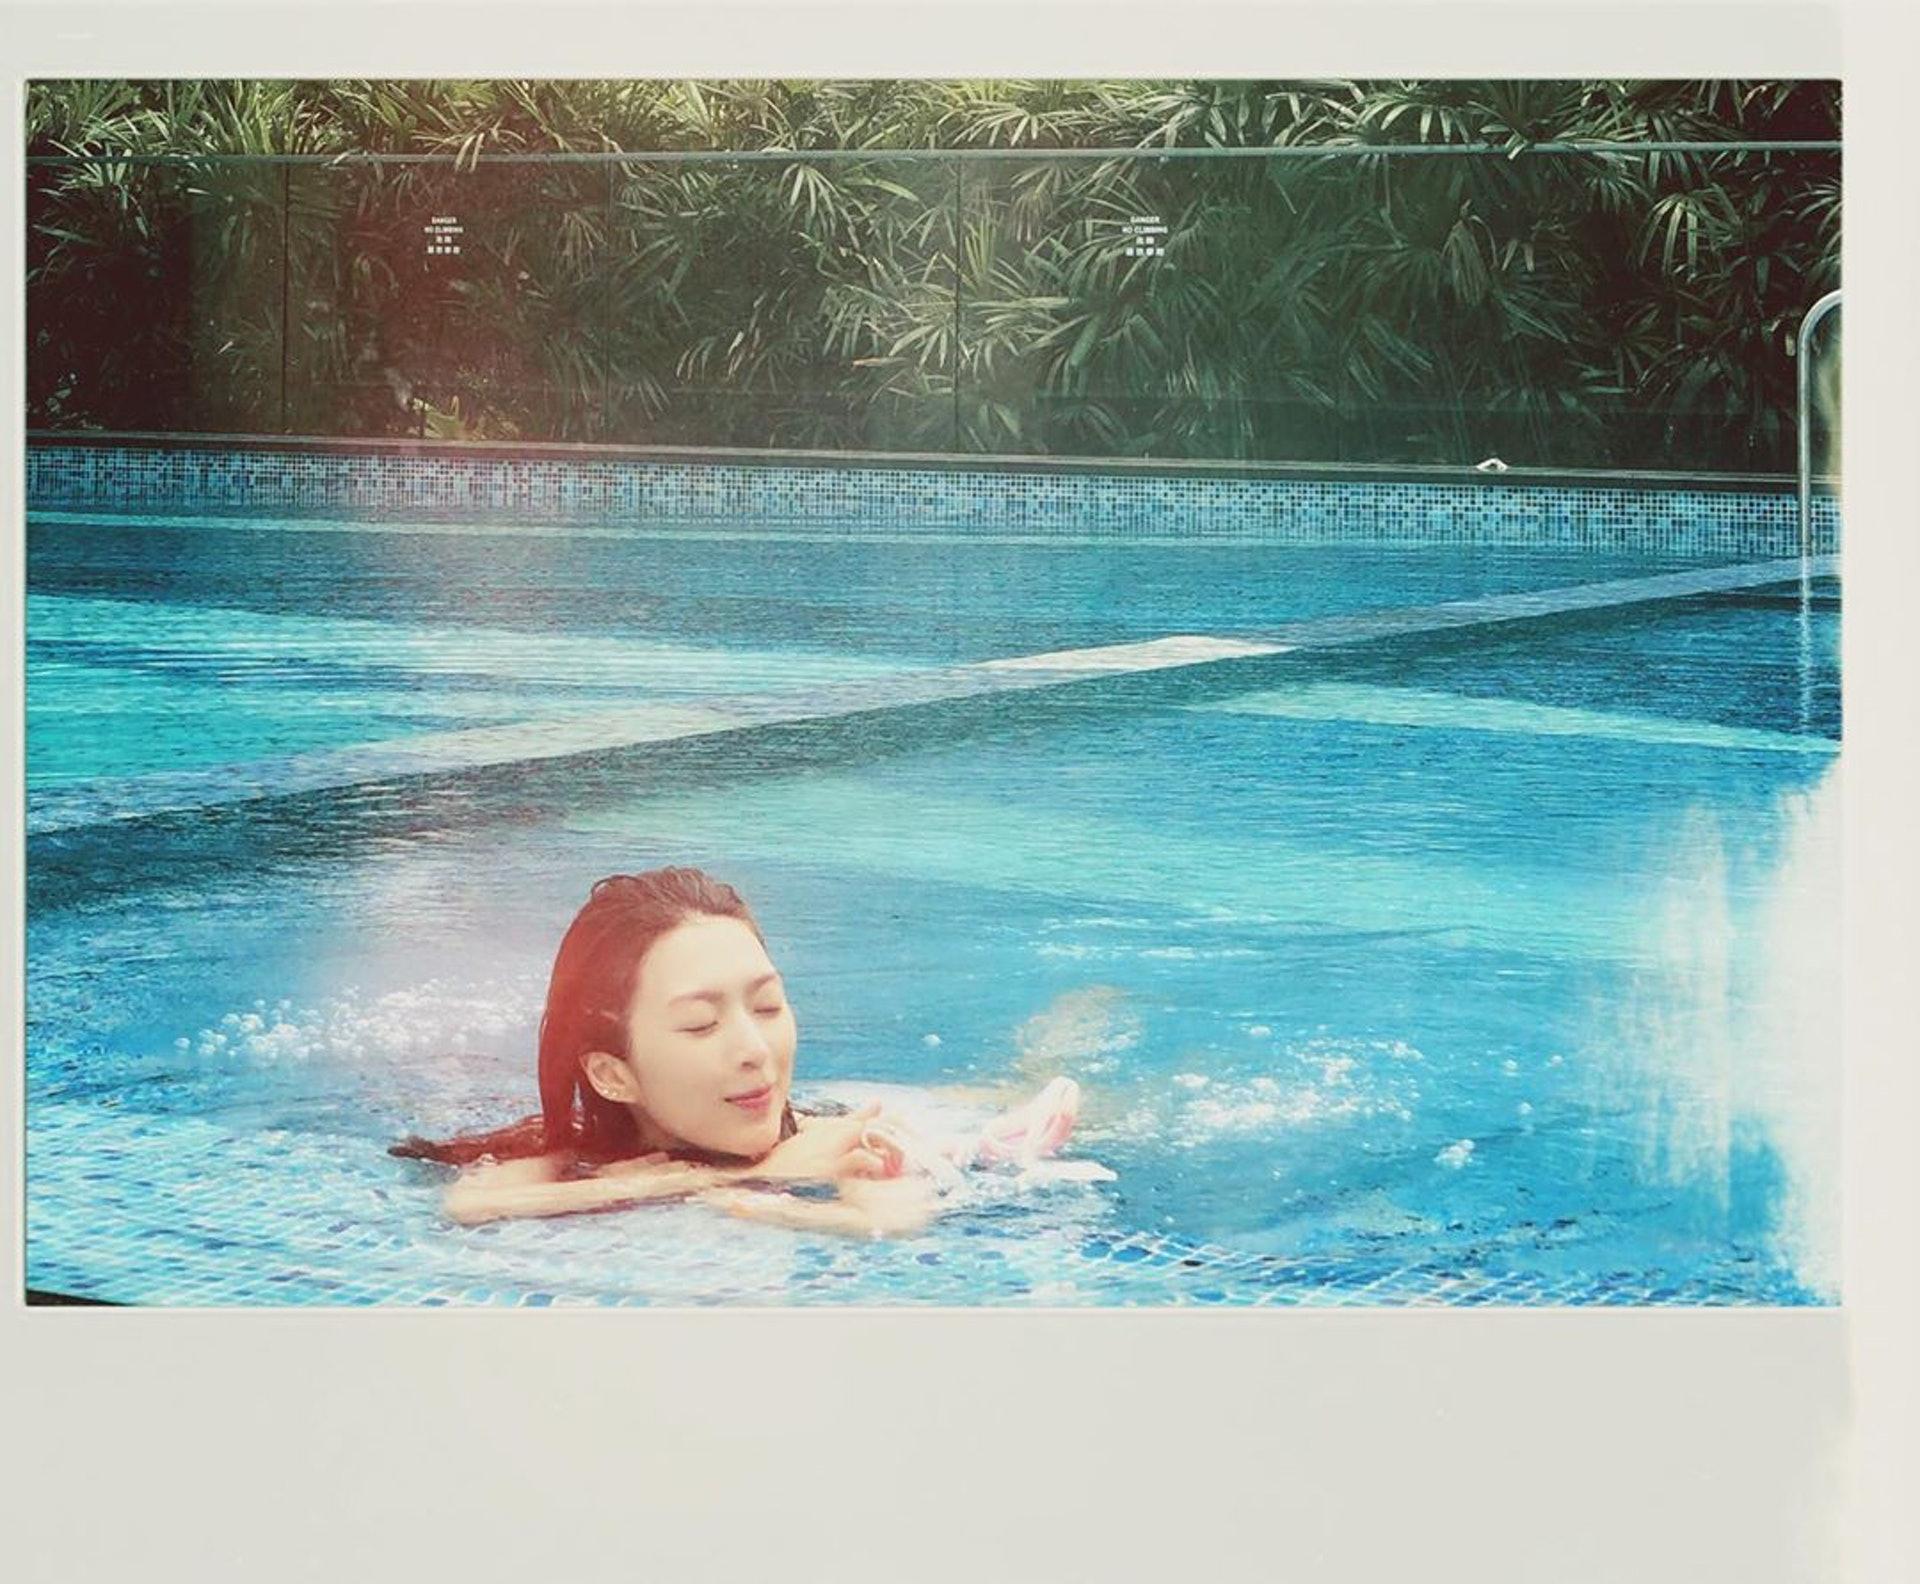 Shiga忙裡偷閒去游水,仲大曬泳裝,吸引大批粉絲留言讚好。(連詩雅IG/@shi_ga)